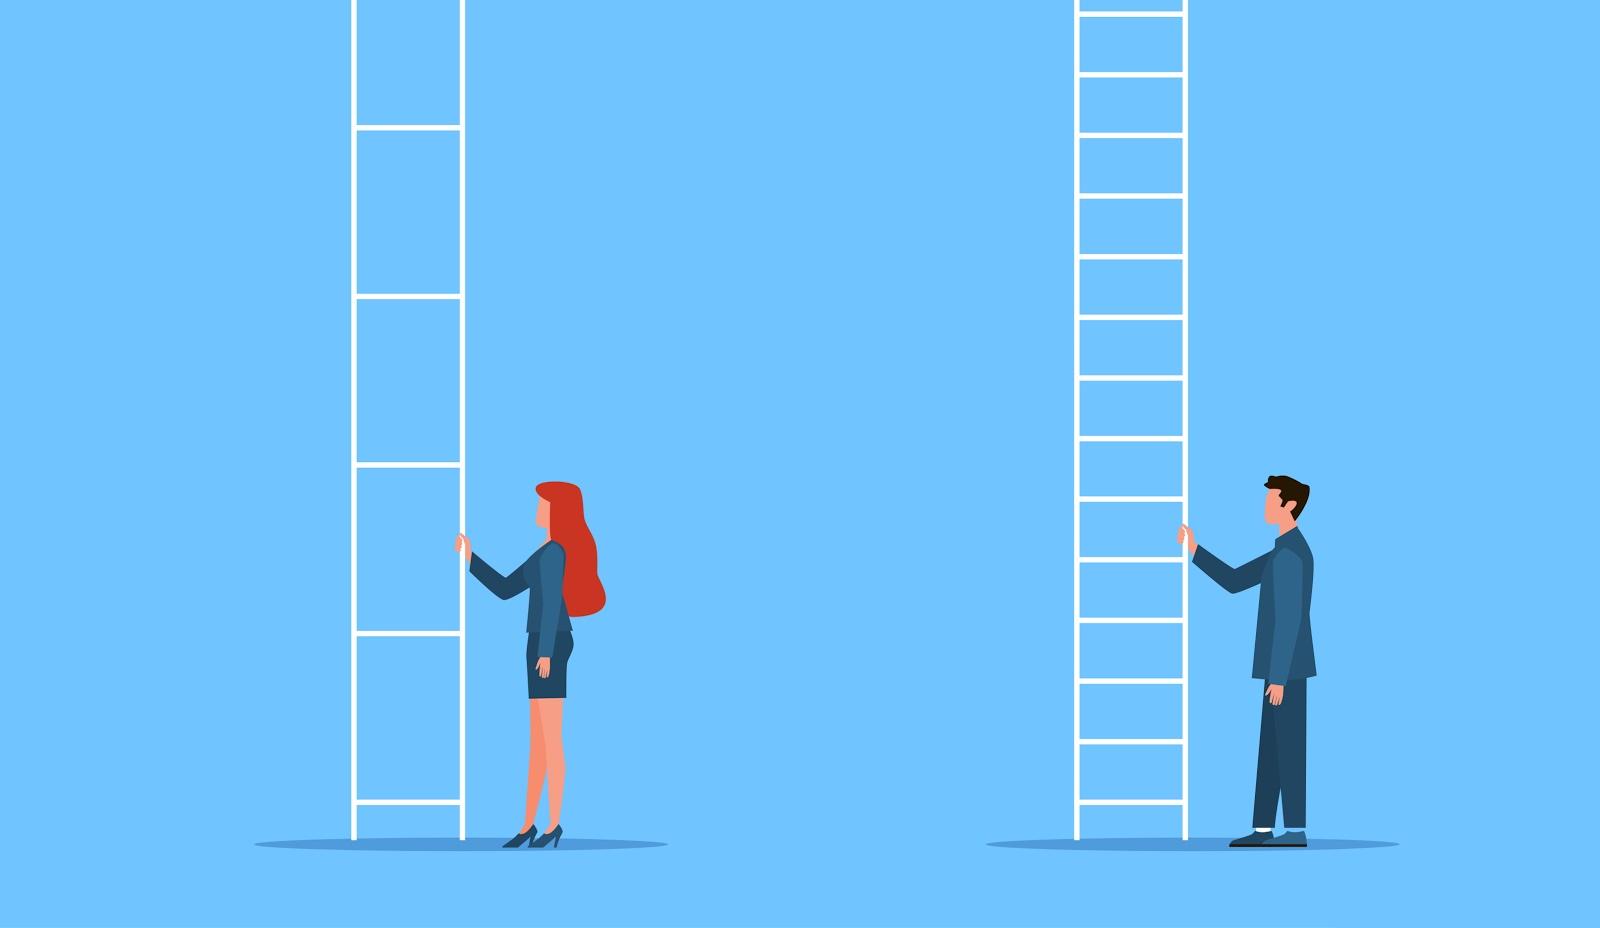 illustration depicting gender gap between man and wonan